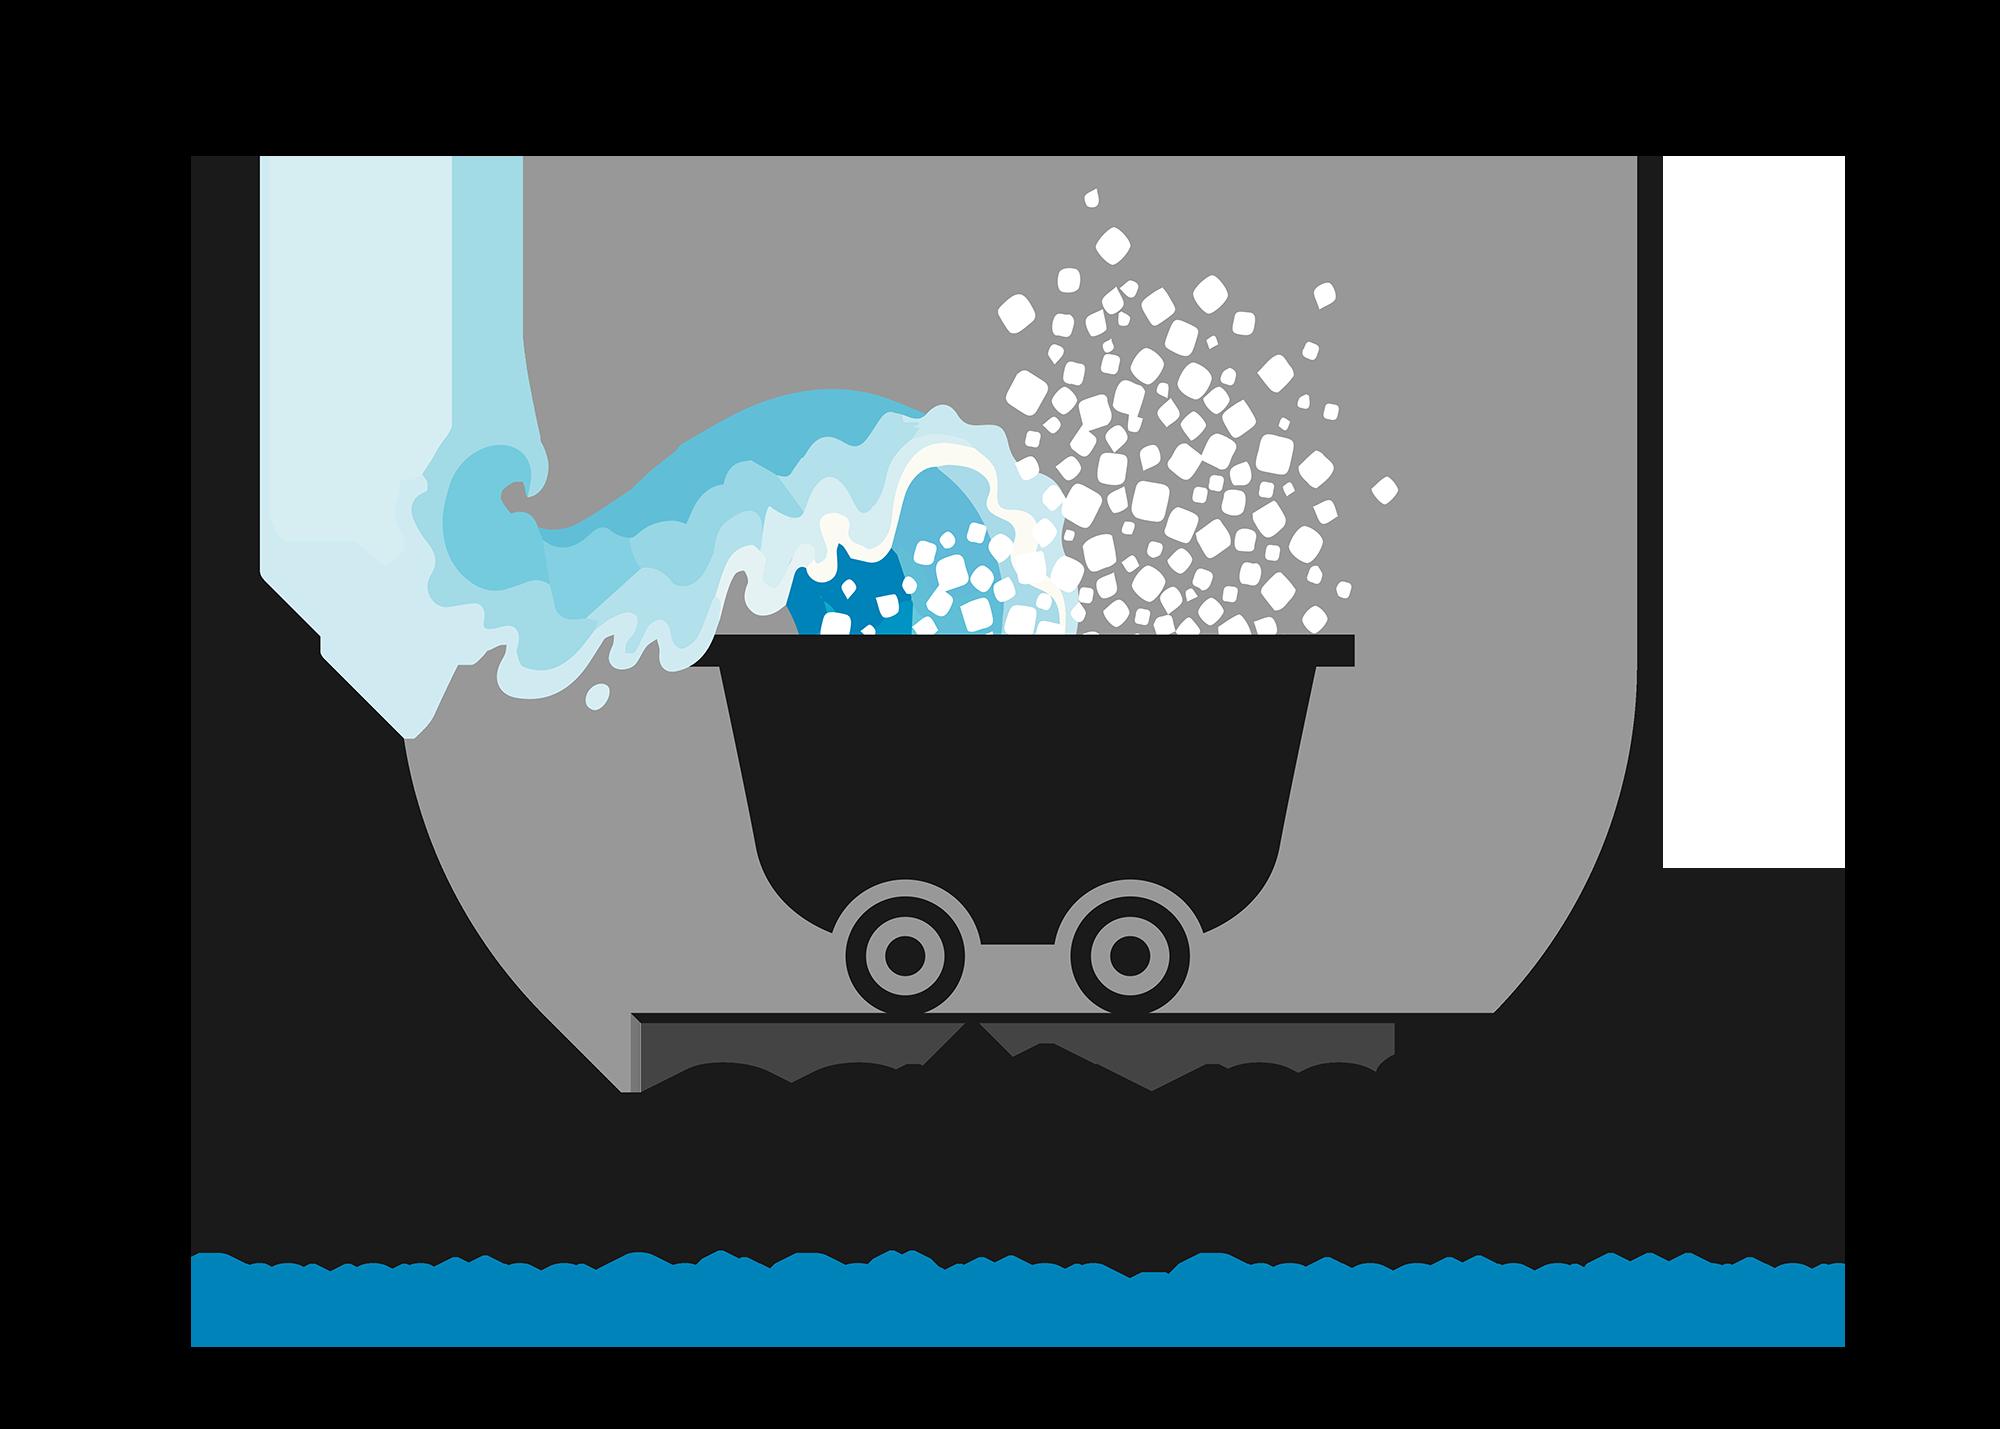 Contact Us - The Salt Miner